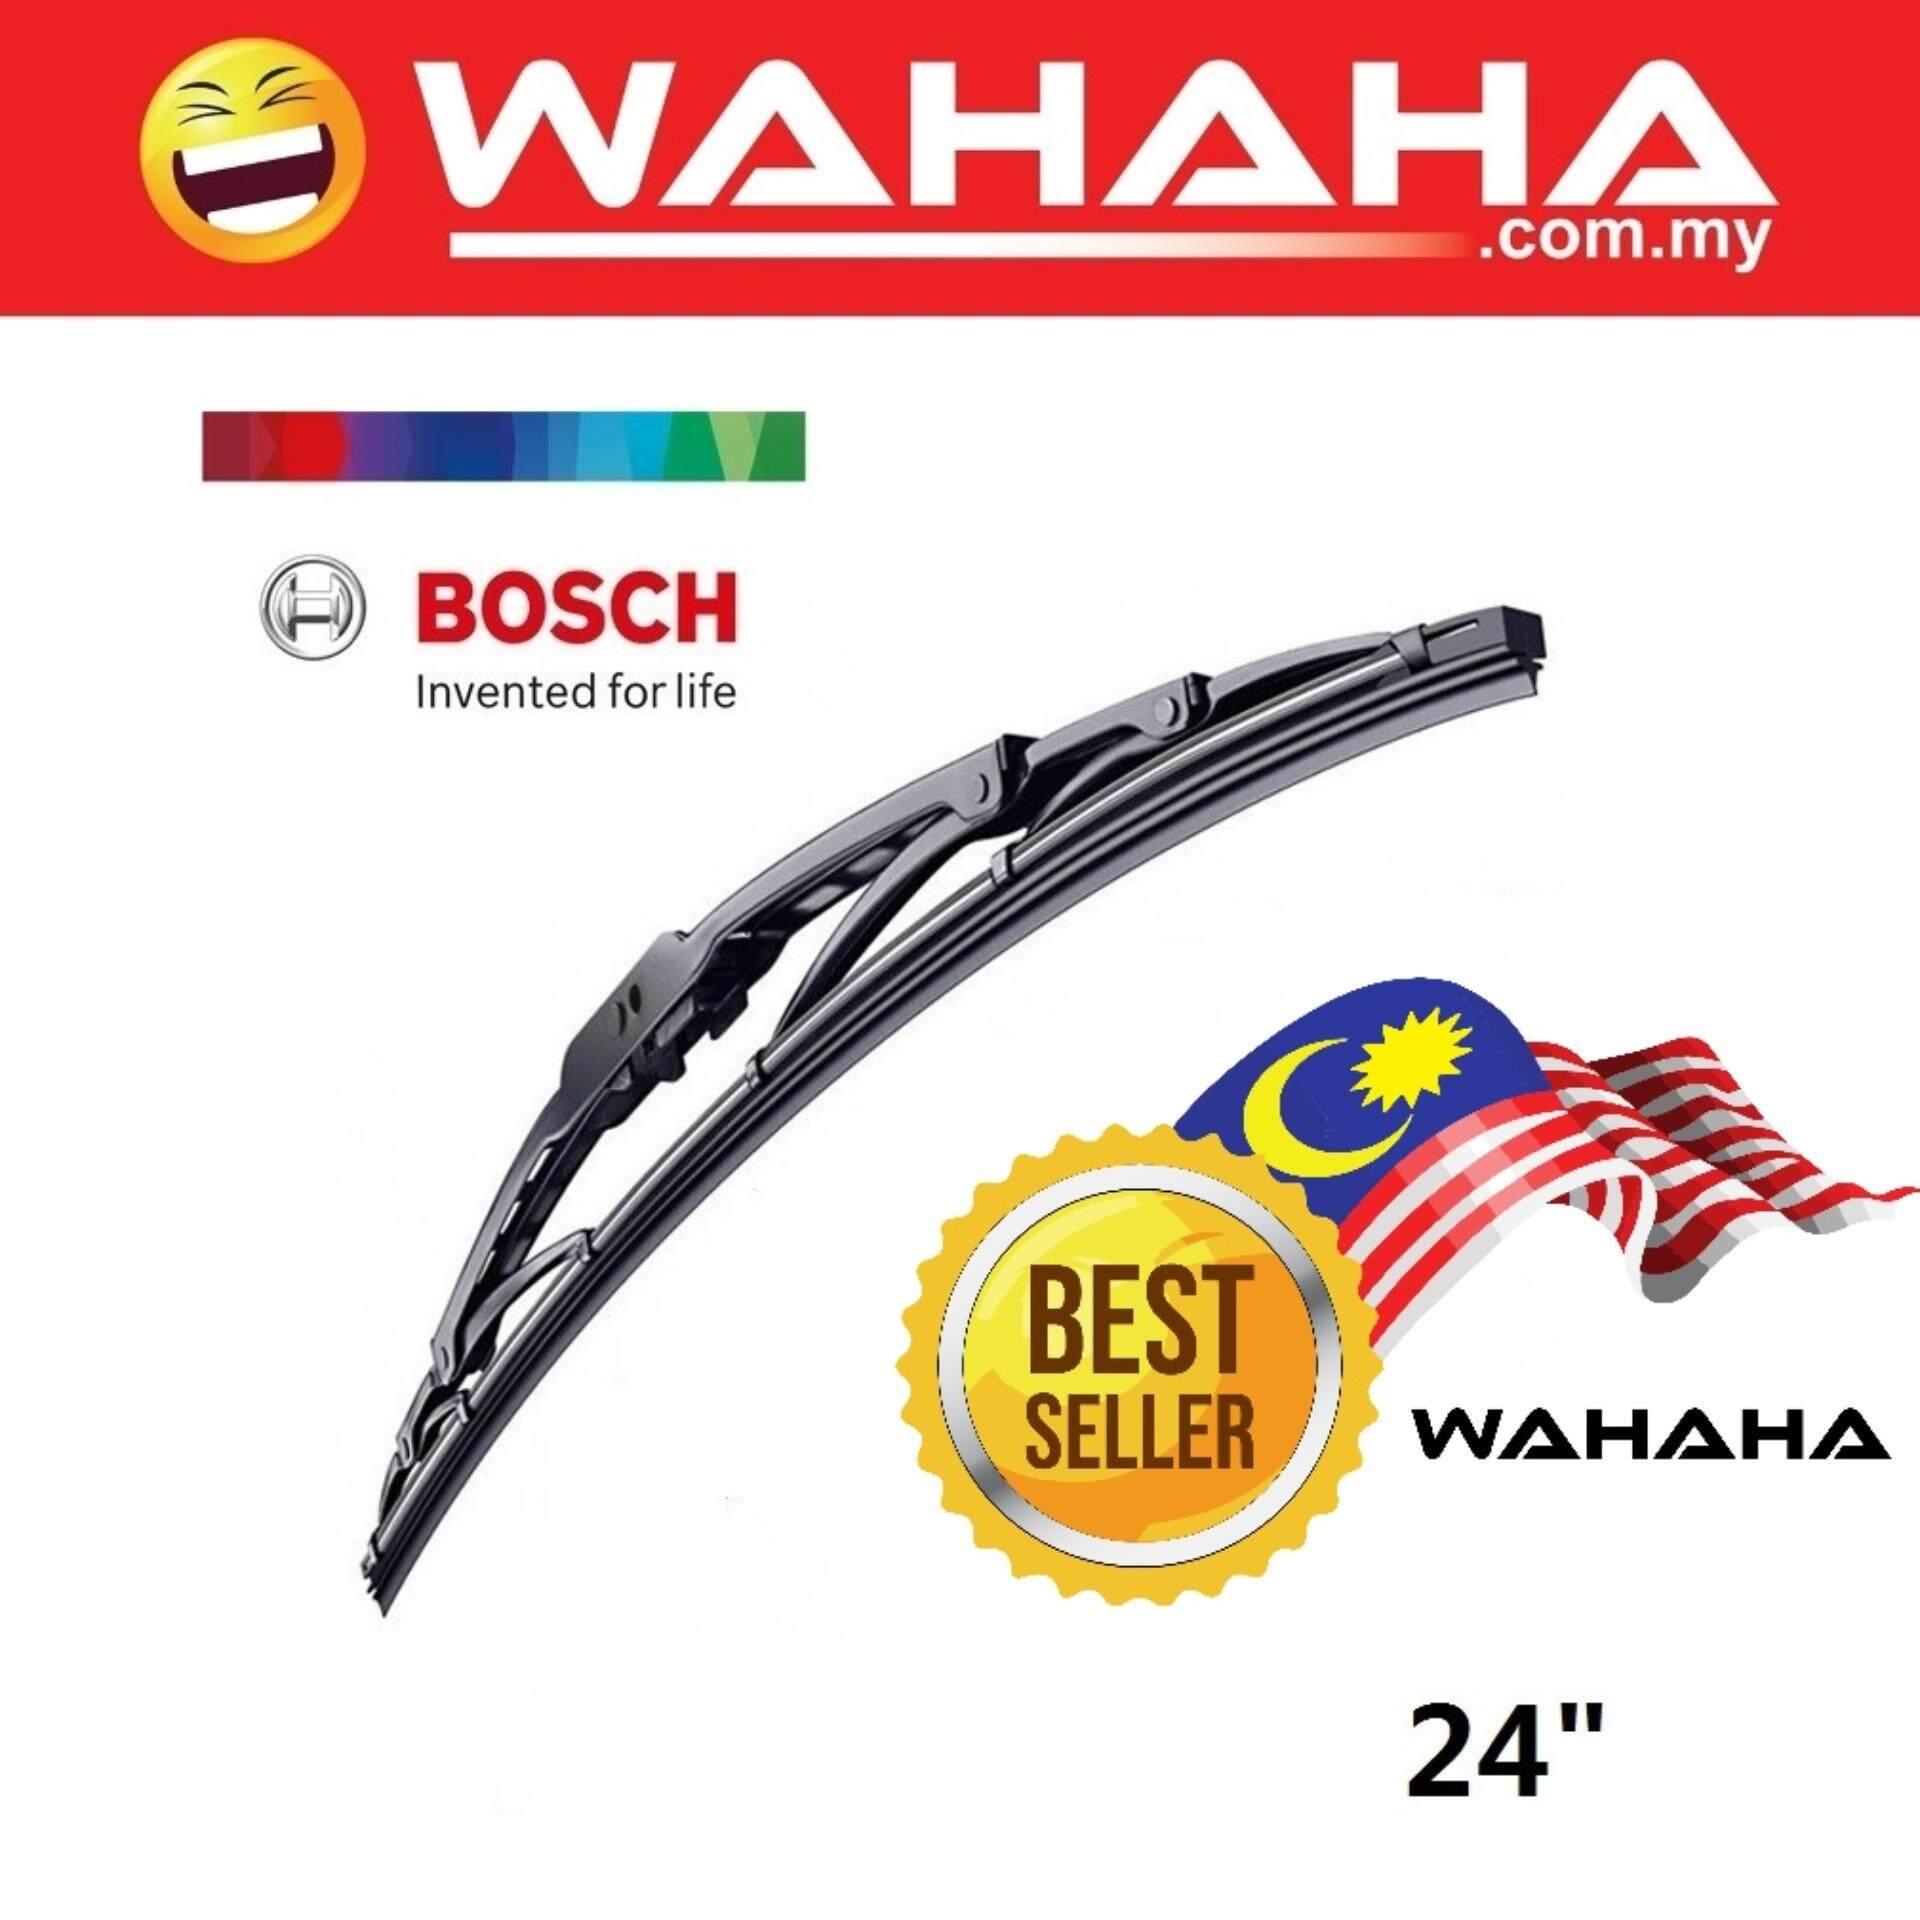 24 Bosch Advantage BA24 Wiper Blade